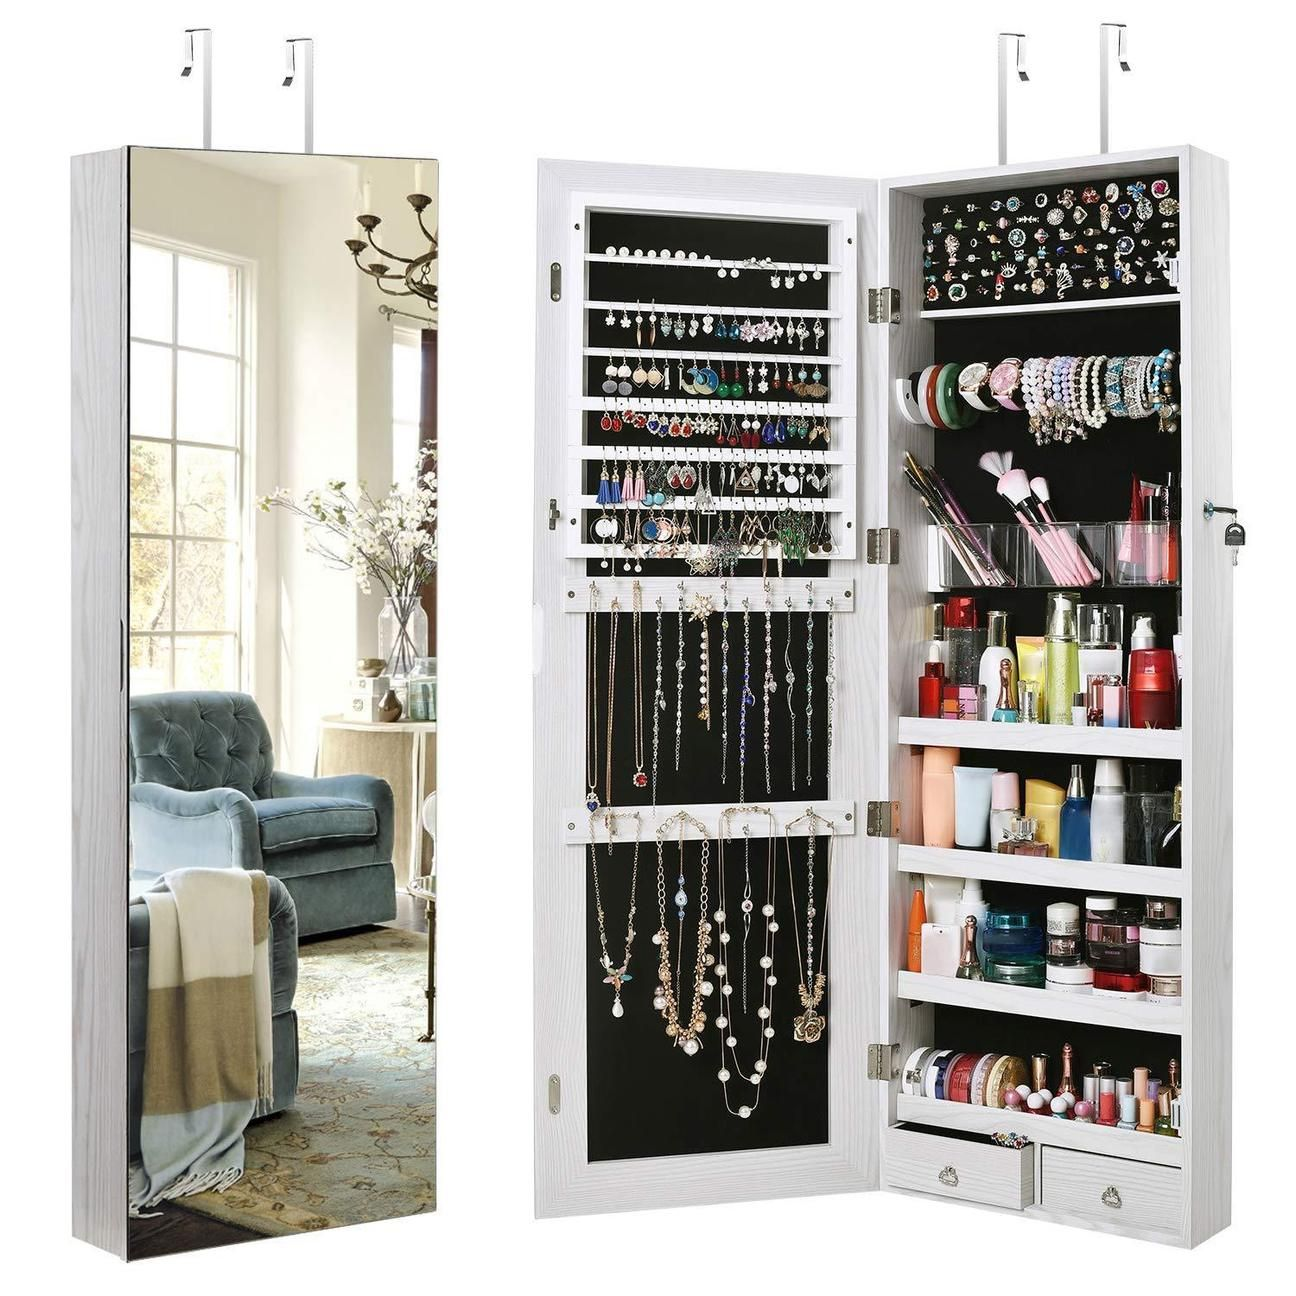 Mounted Jewelry Cabinet Organizer Mirror Jewelry Storage Hidden Jewelry Storage Jewelry Cabinet